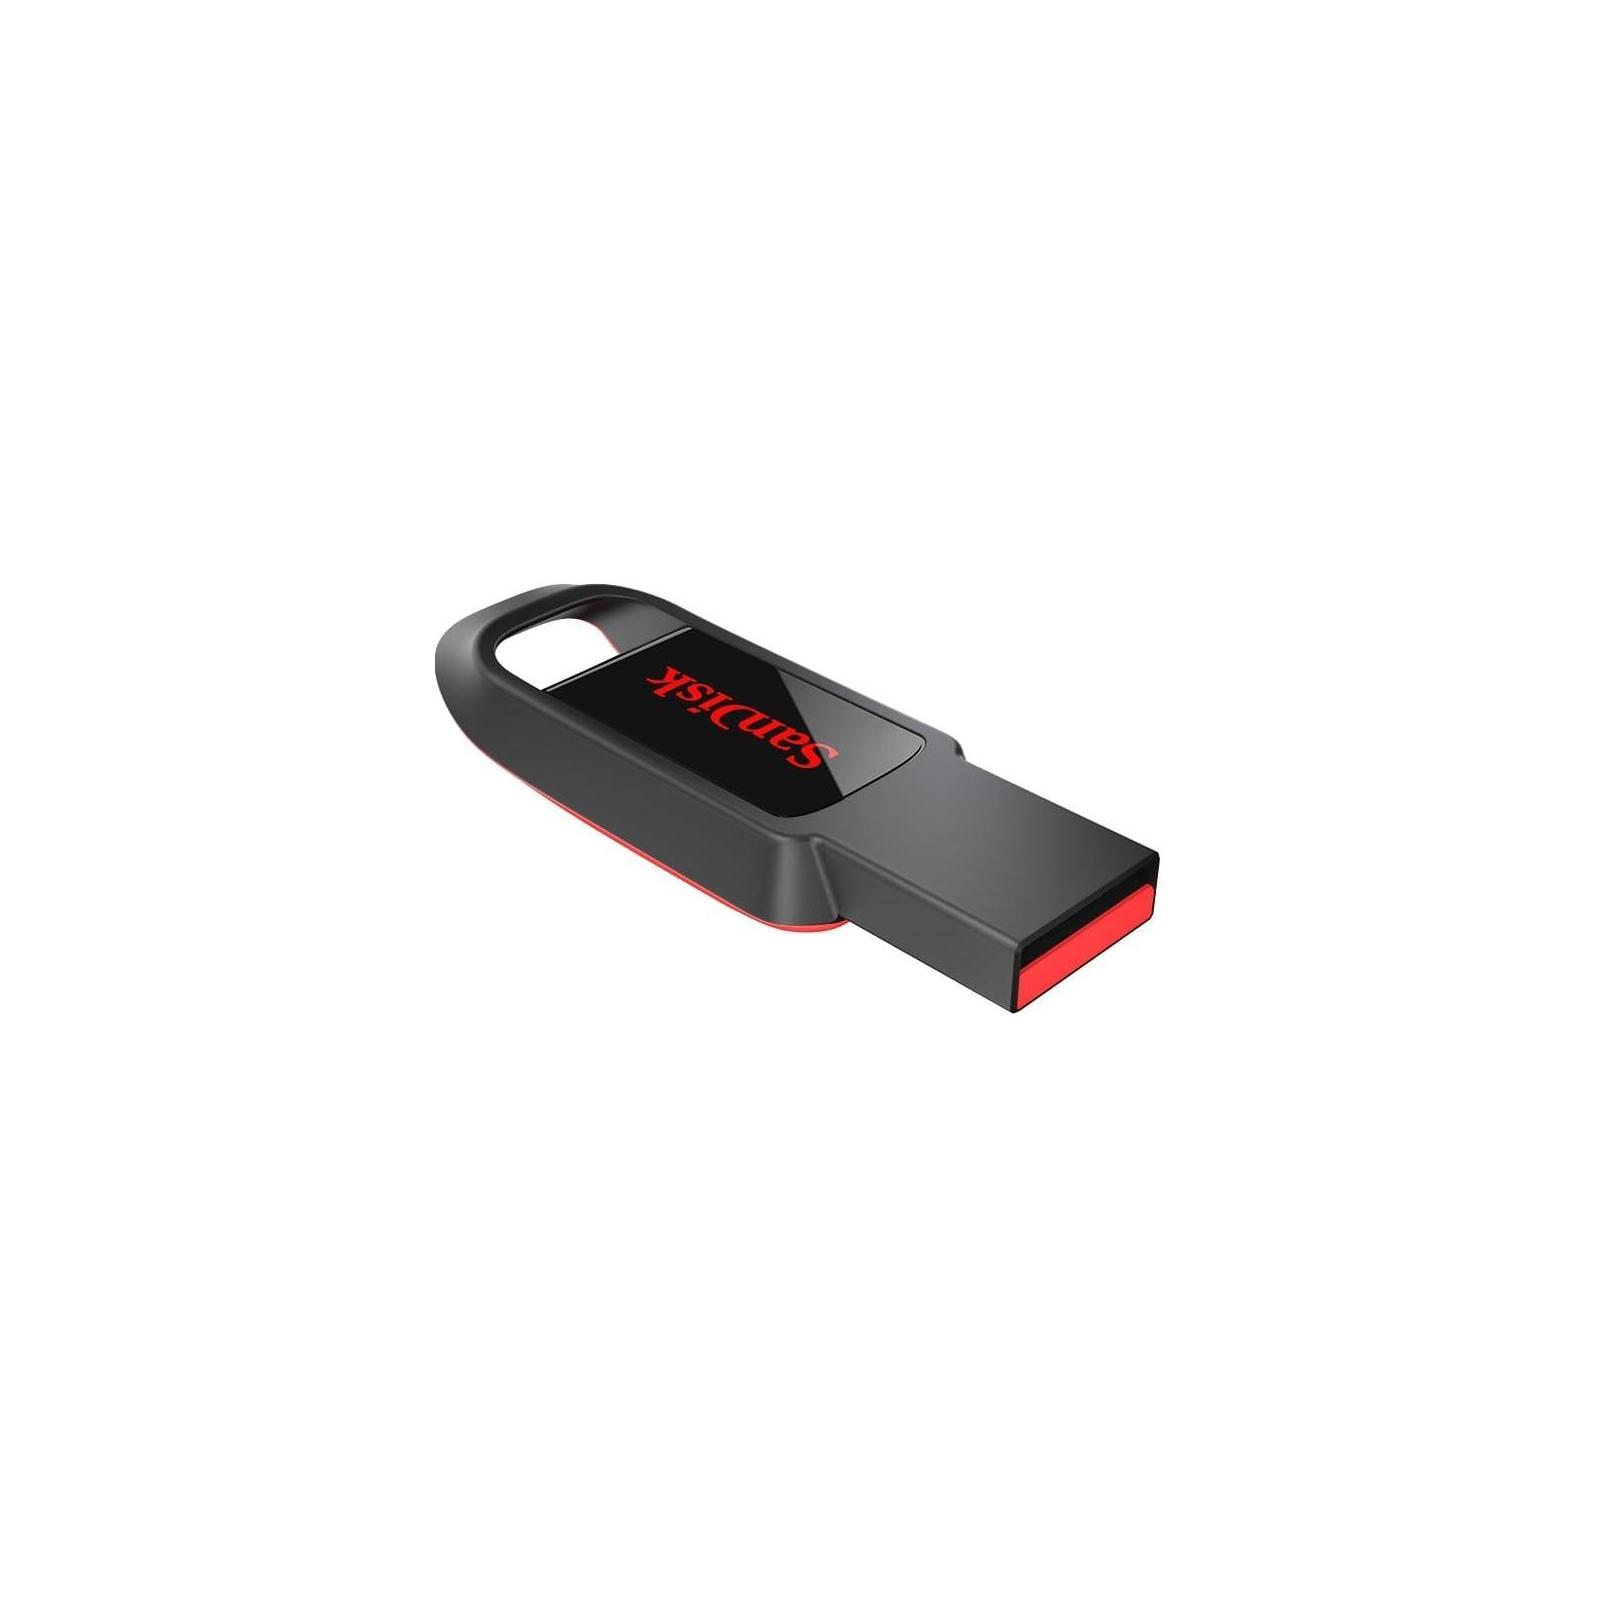 USB флеш накопитель SanDisk 16GB Cruzer Spark USB 2.0 (SDCZ61-016G-G35) изображение 2